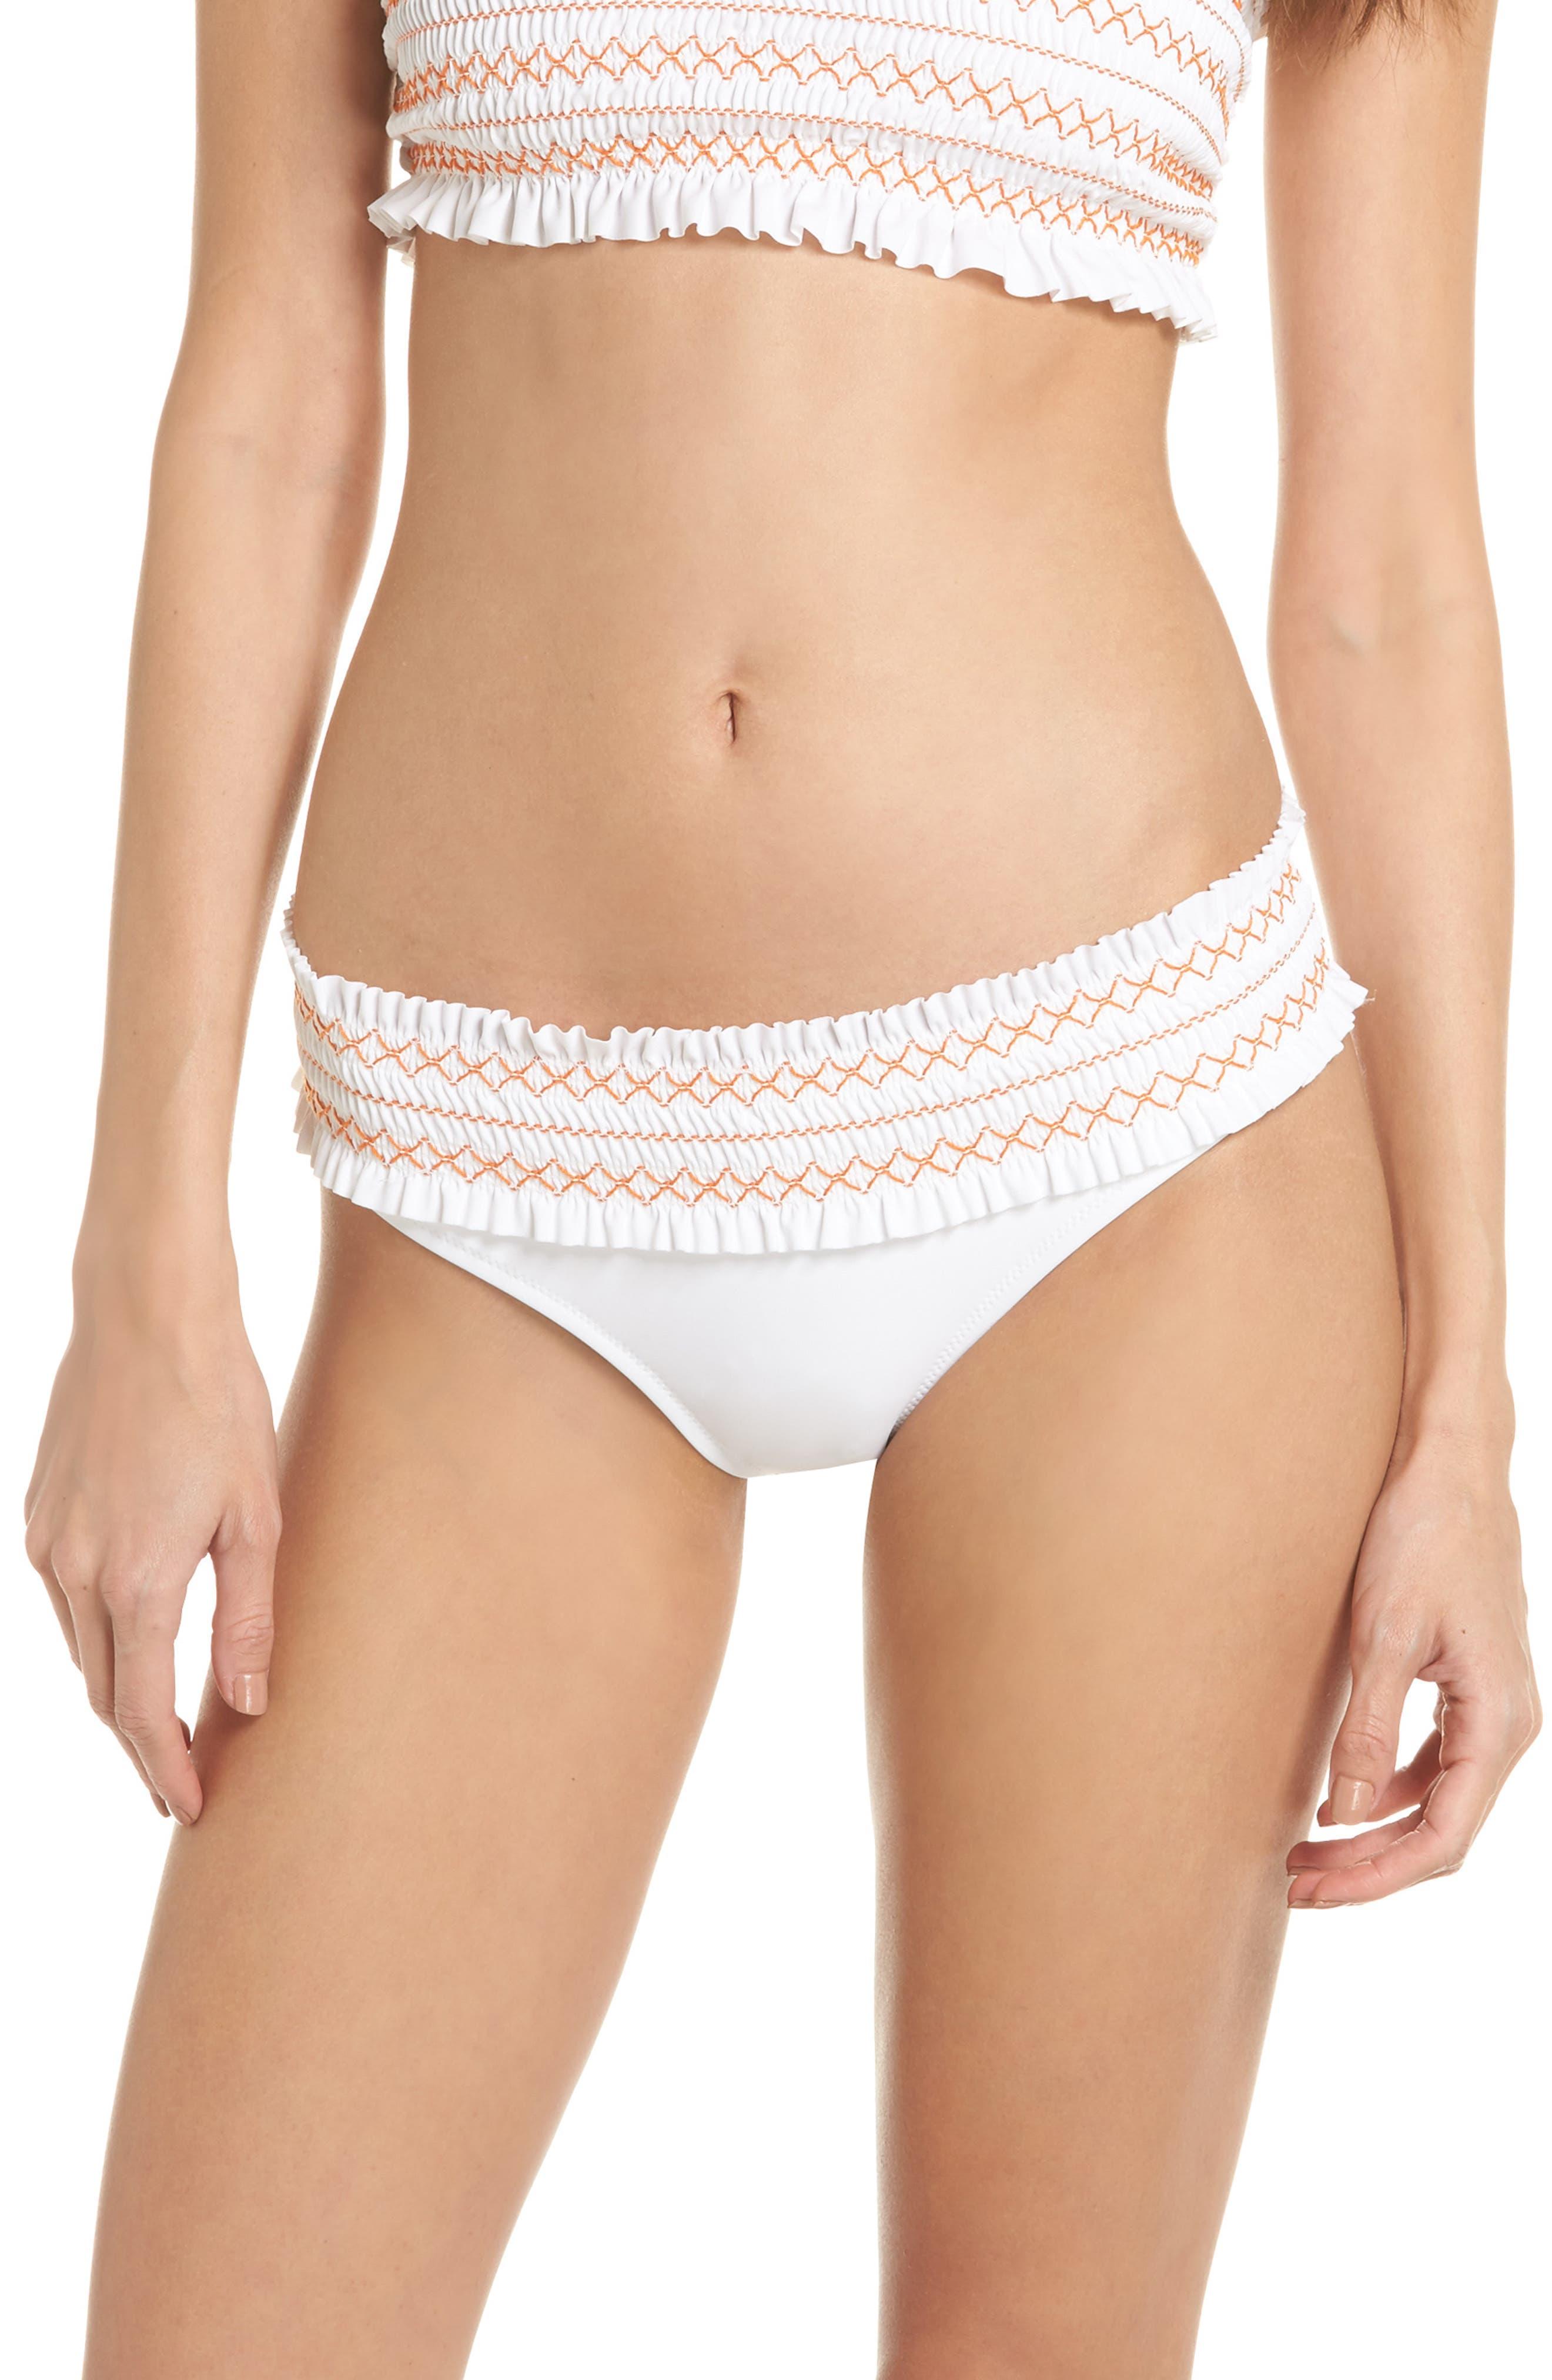 Costa Smocked Hipster Bikini Bottoms,                             Main thumbnail 1, color,                             100